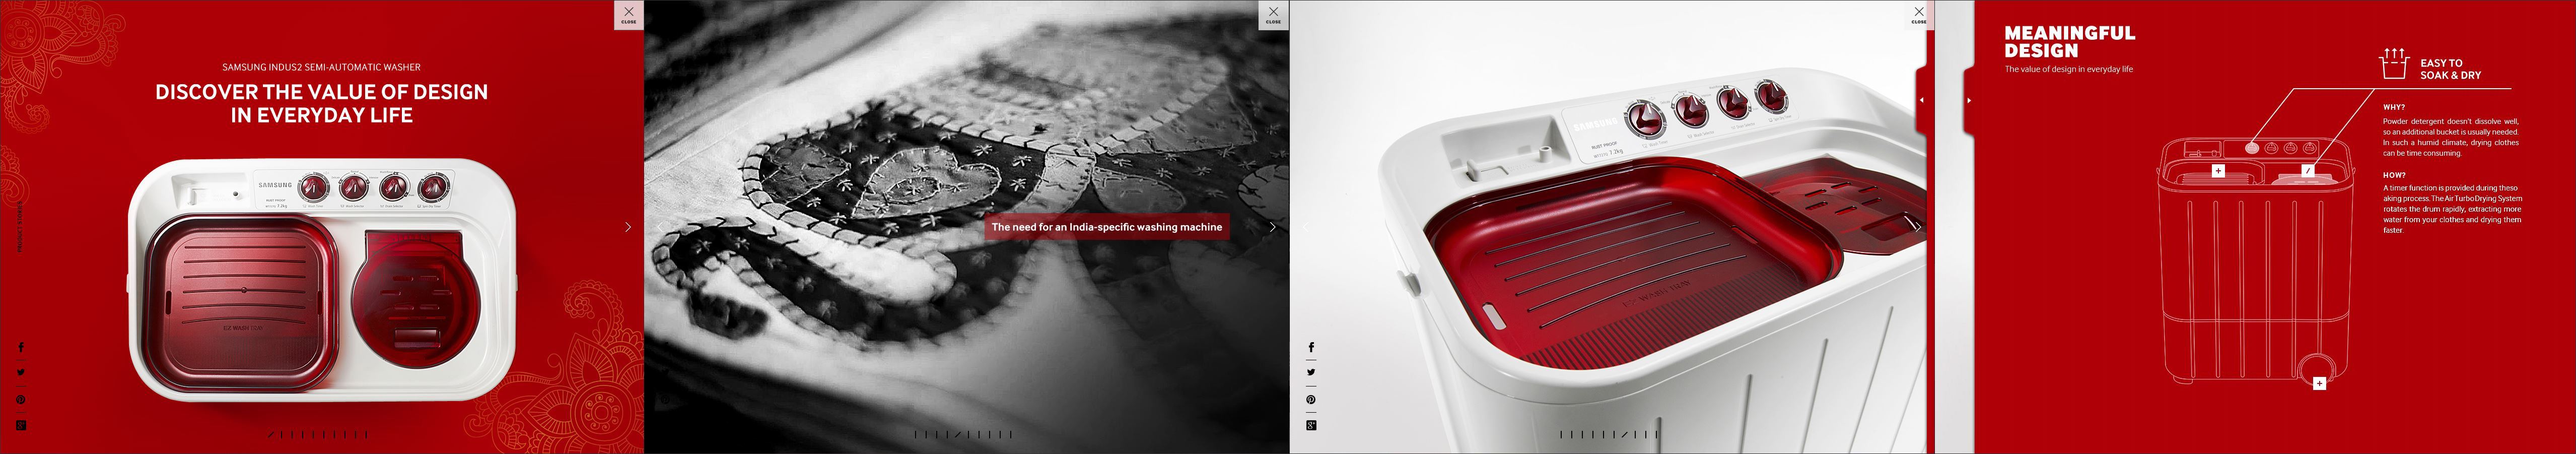 design.samsung.com_product stories-2